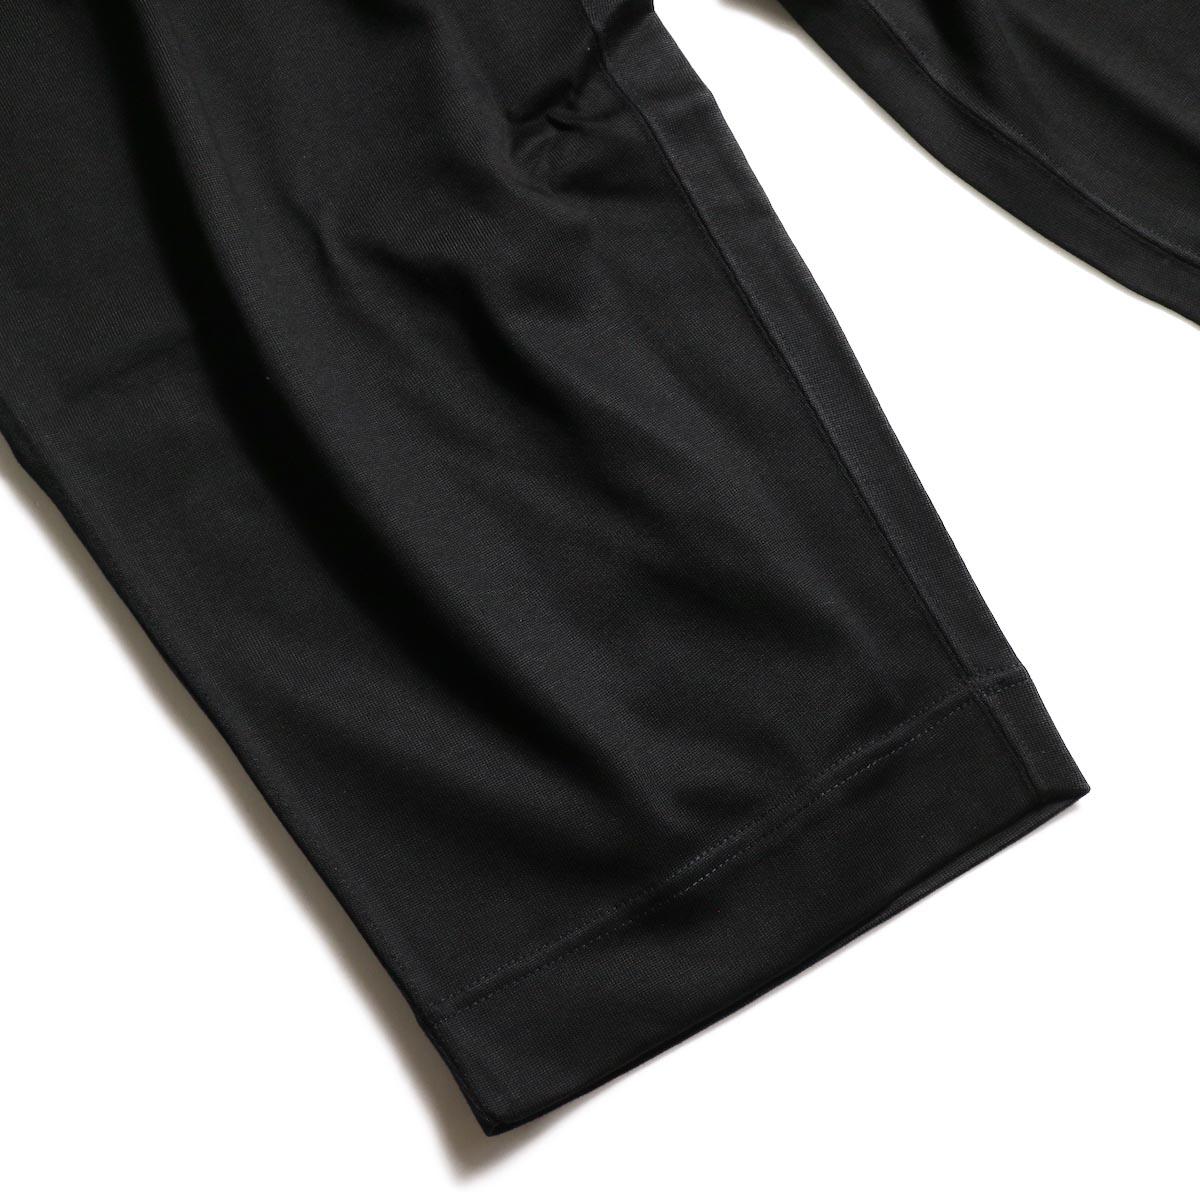 N.HOOLYWOOD / 1202-CP05-034  Wide Easy Pants (Black)裾